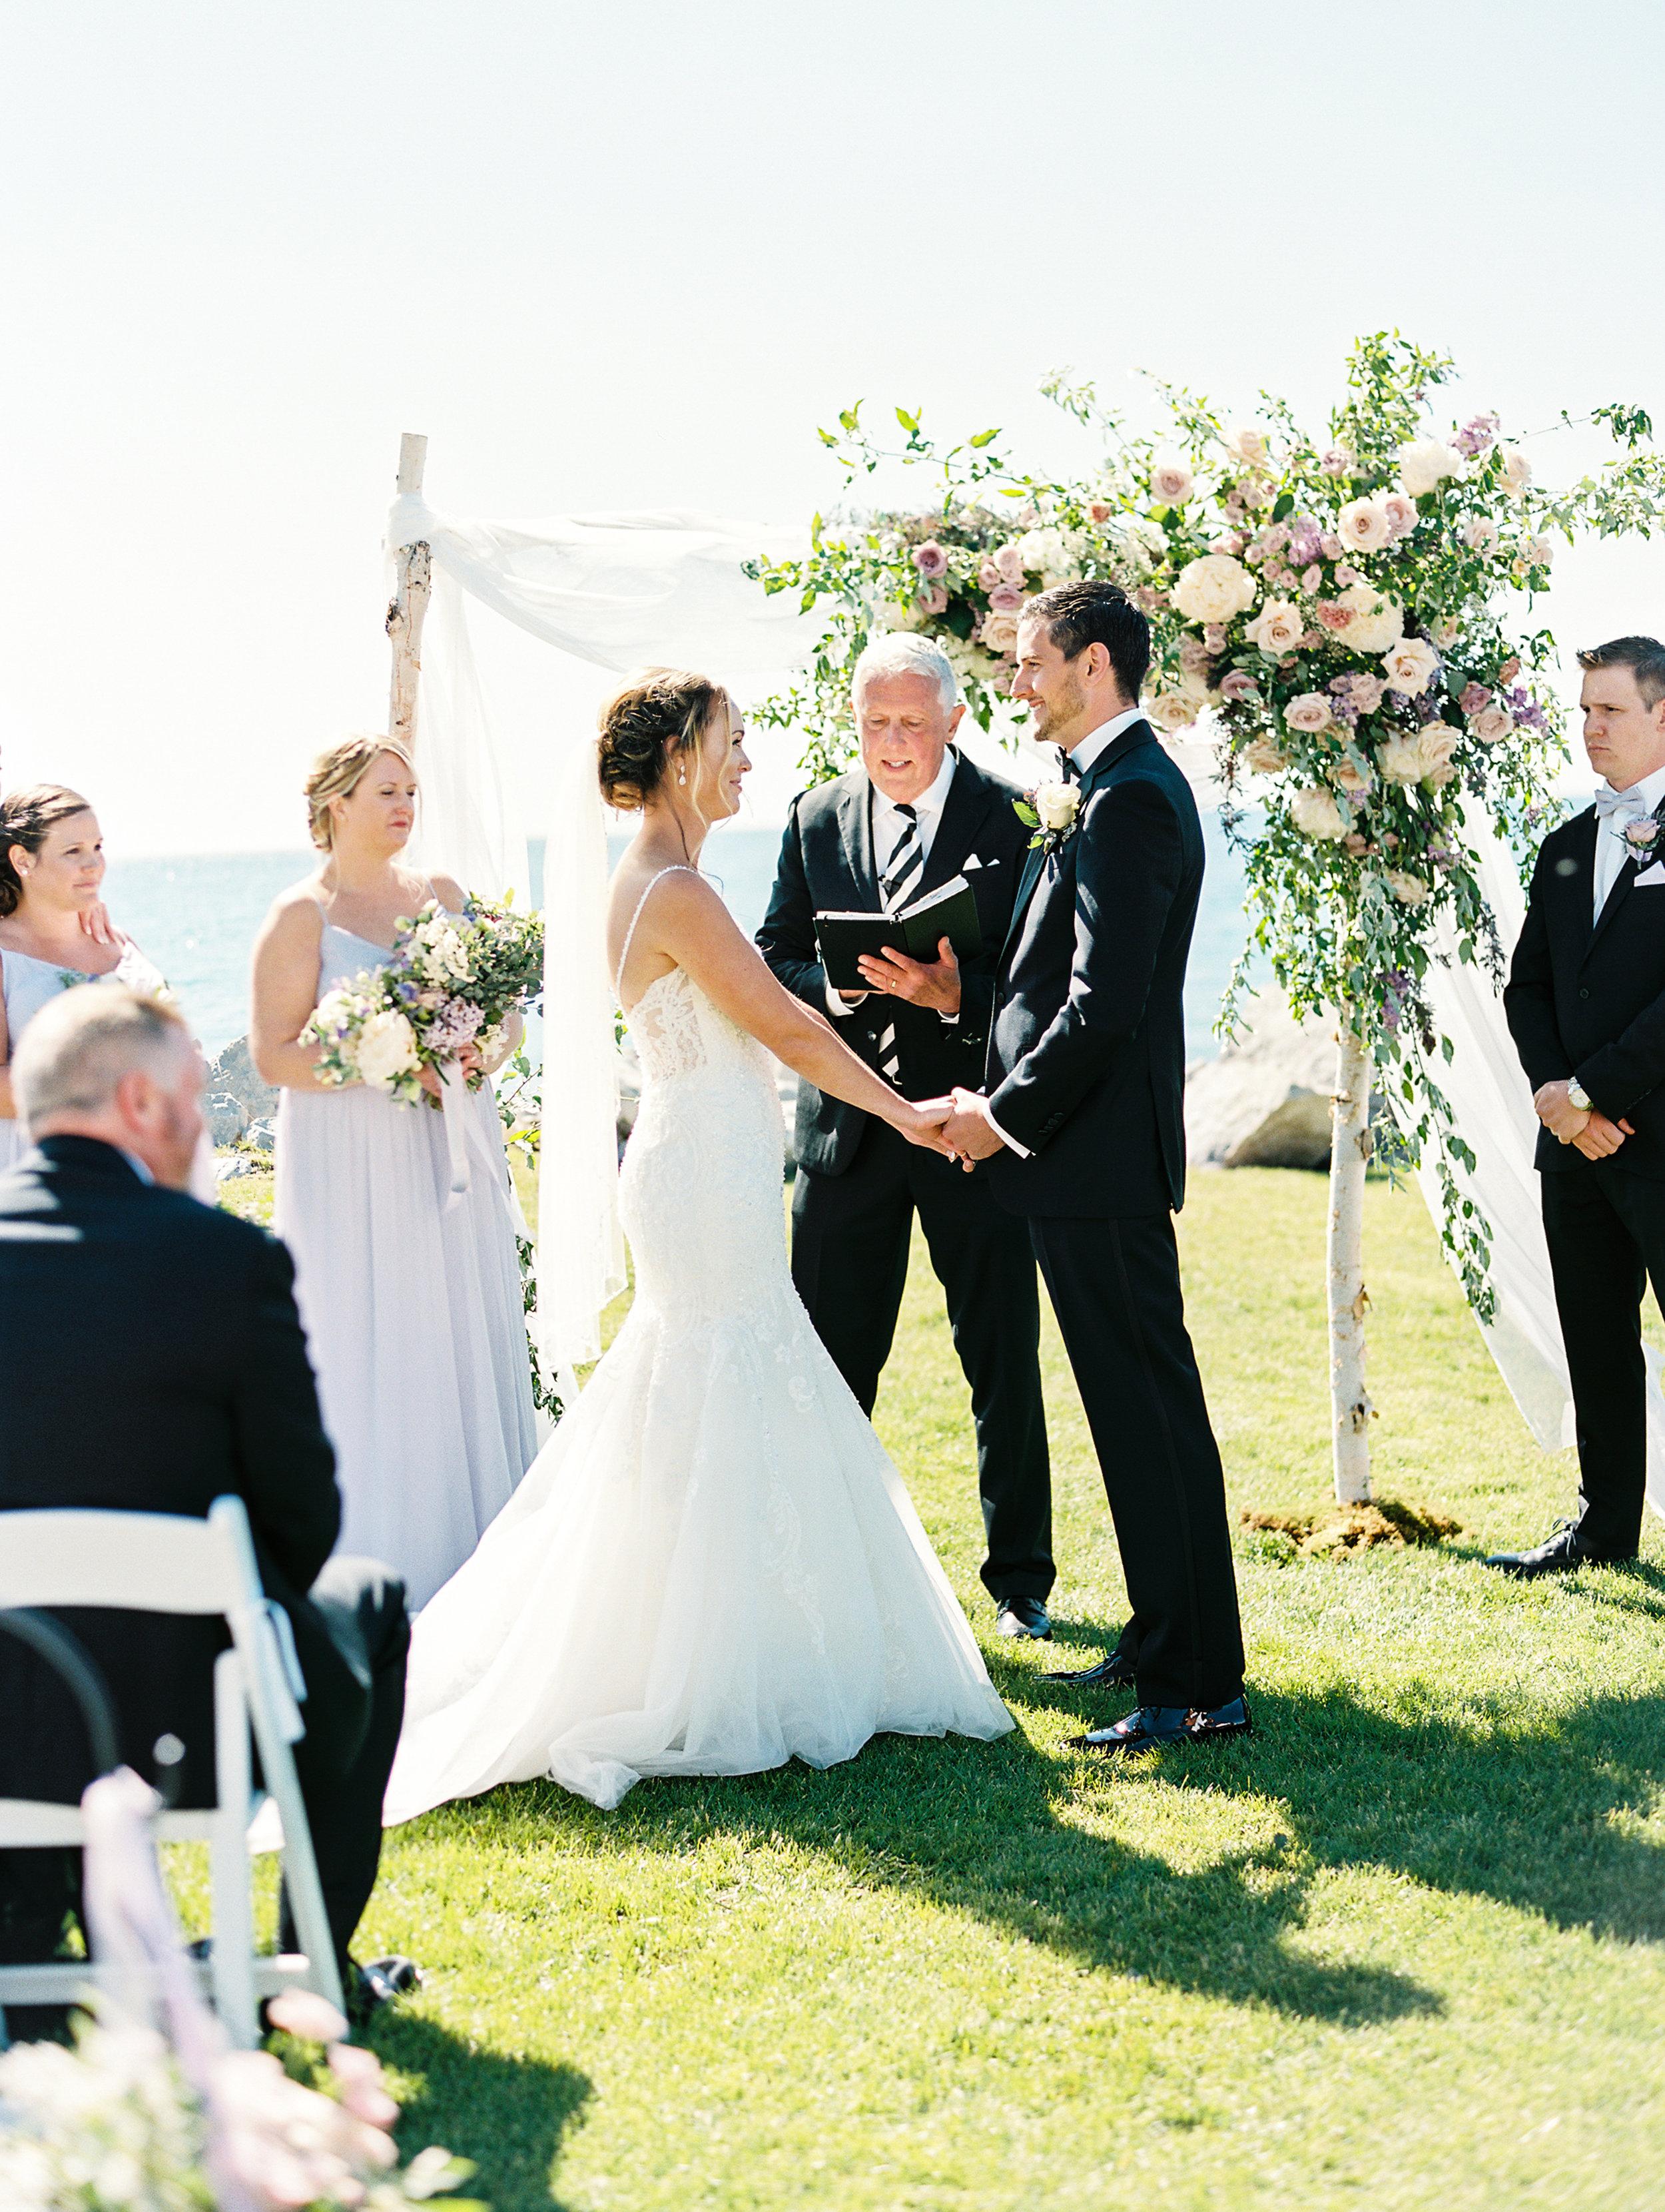 Noss+Wedding+Ceremony-229.jpg